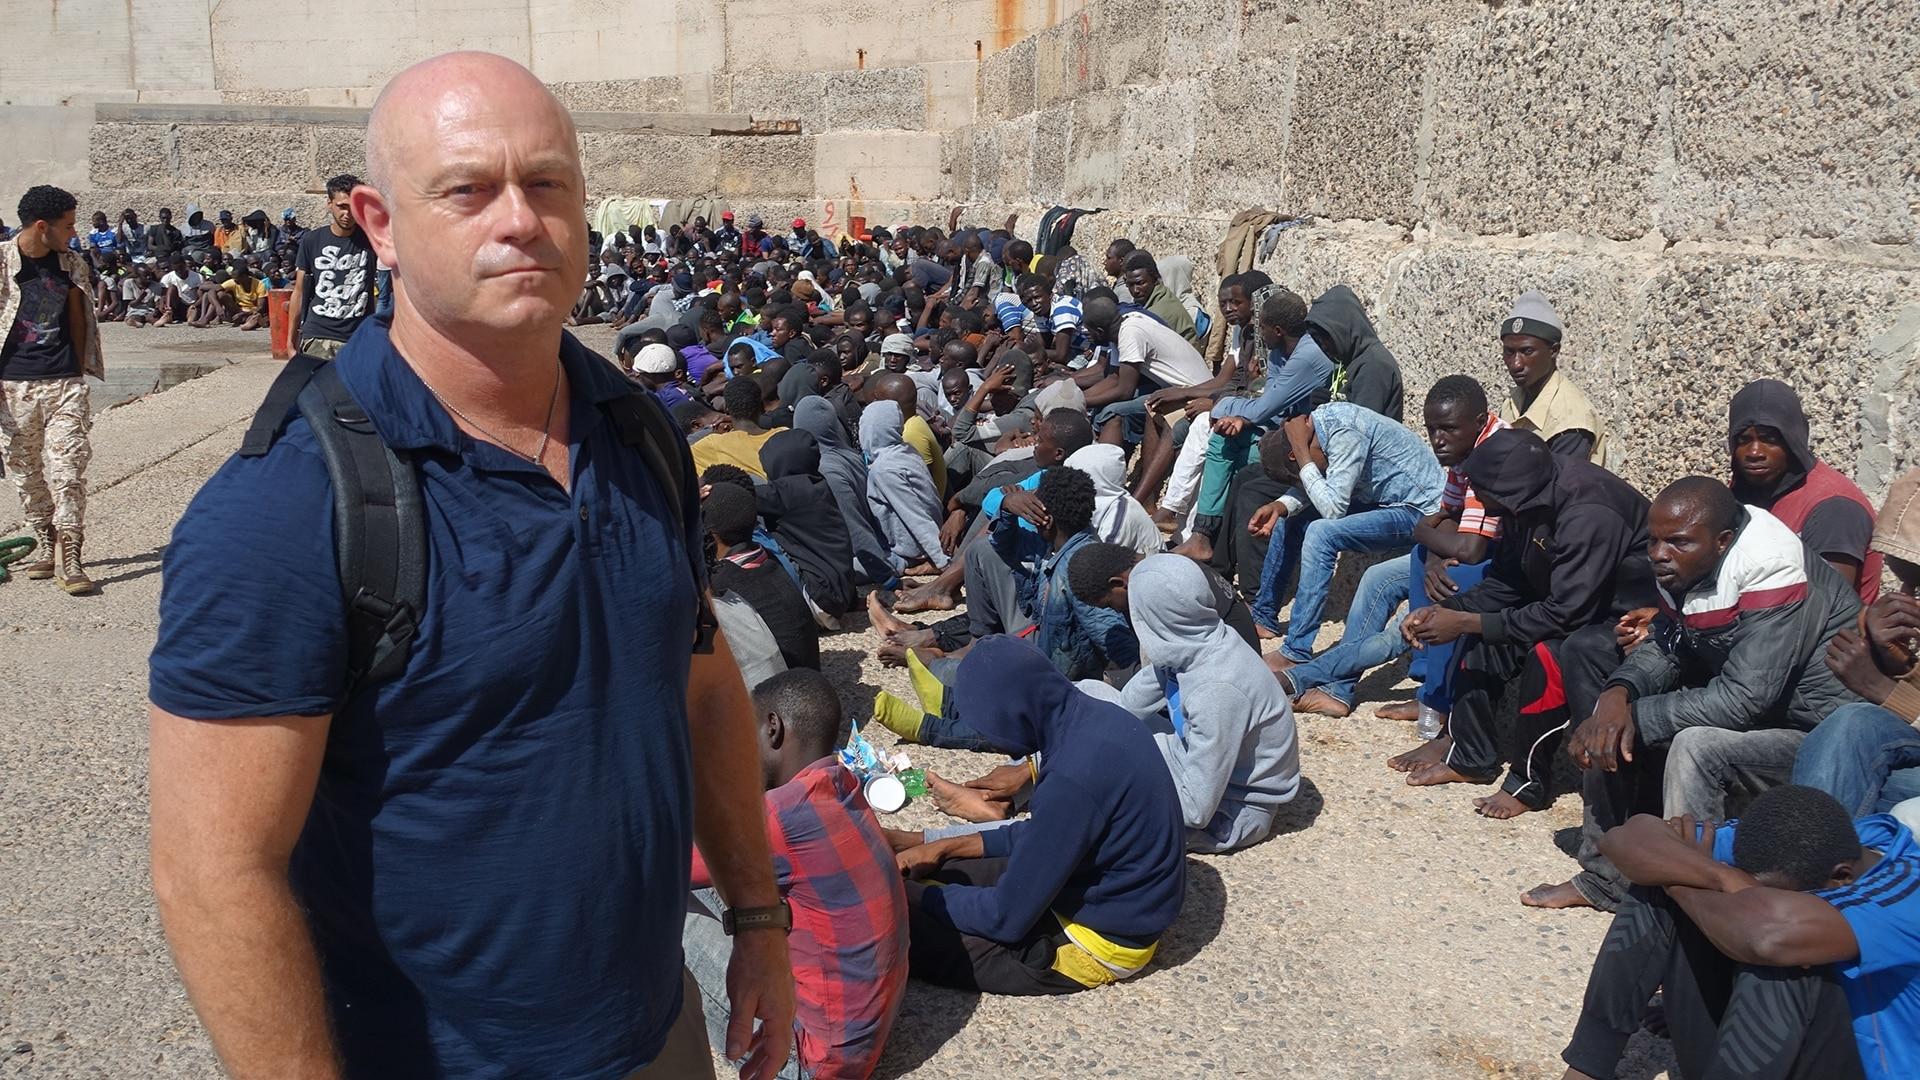 Ross Kemp: Libya's Migrant Hell